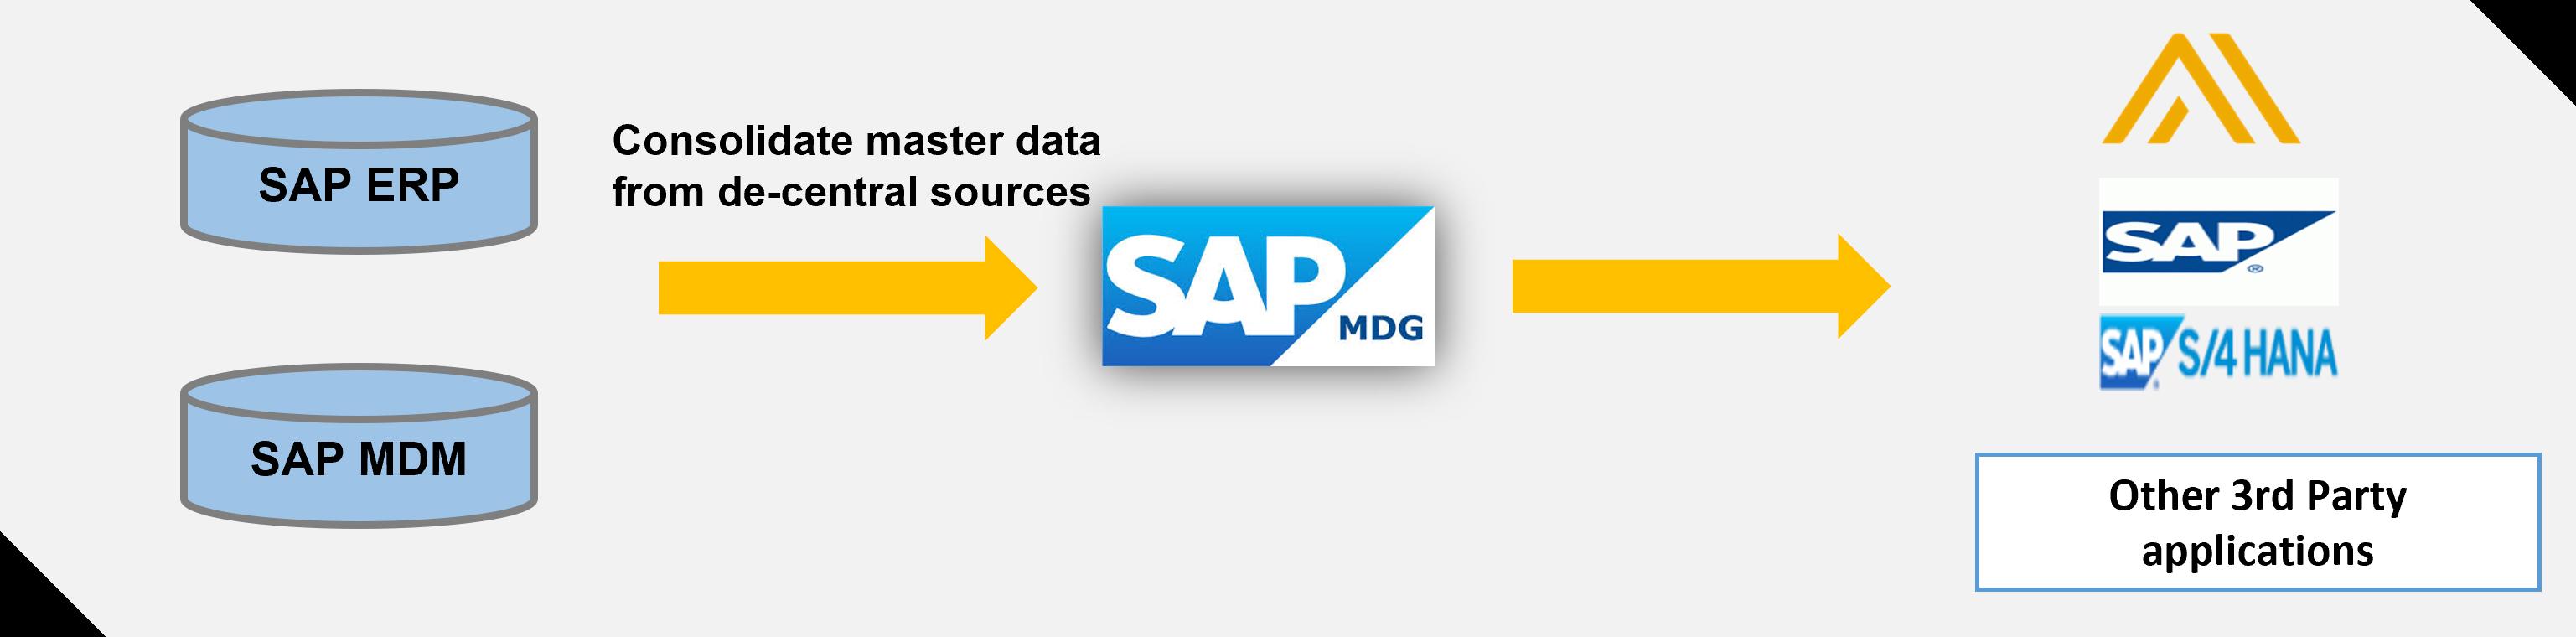 SAP%20MDG